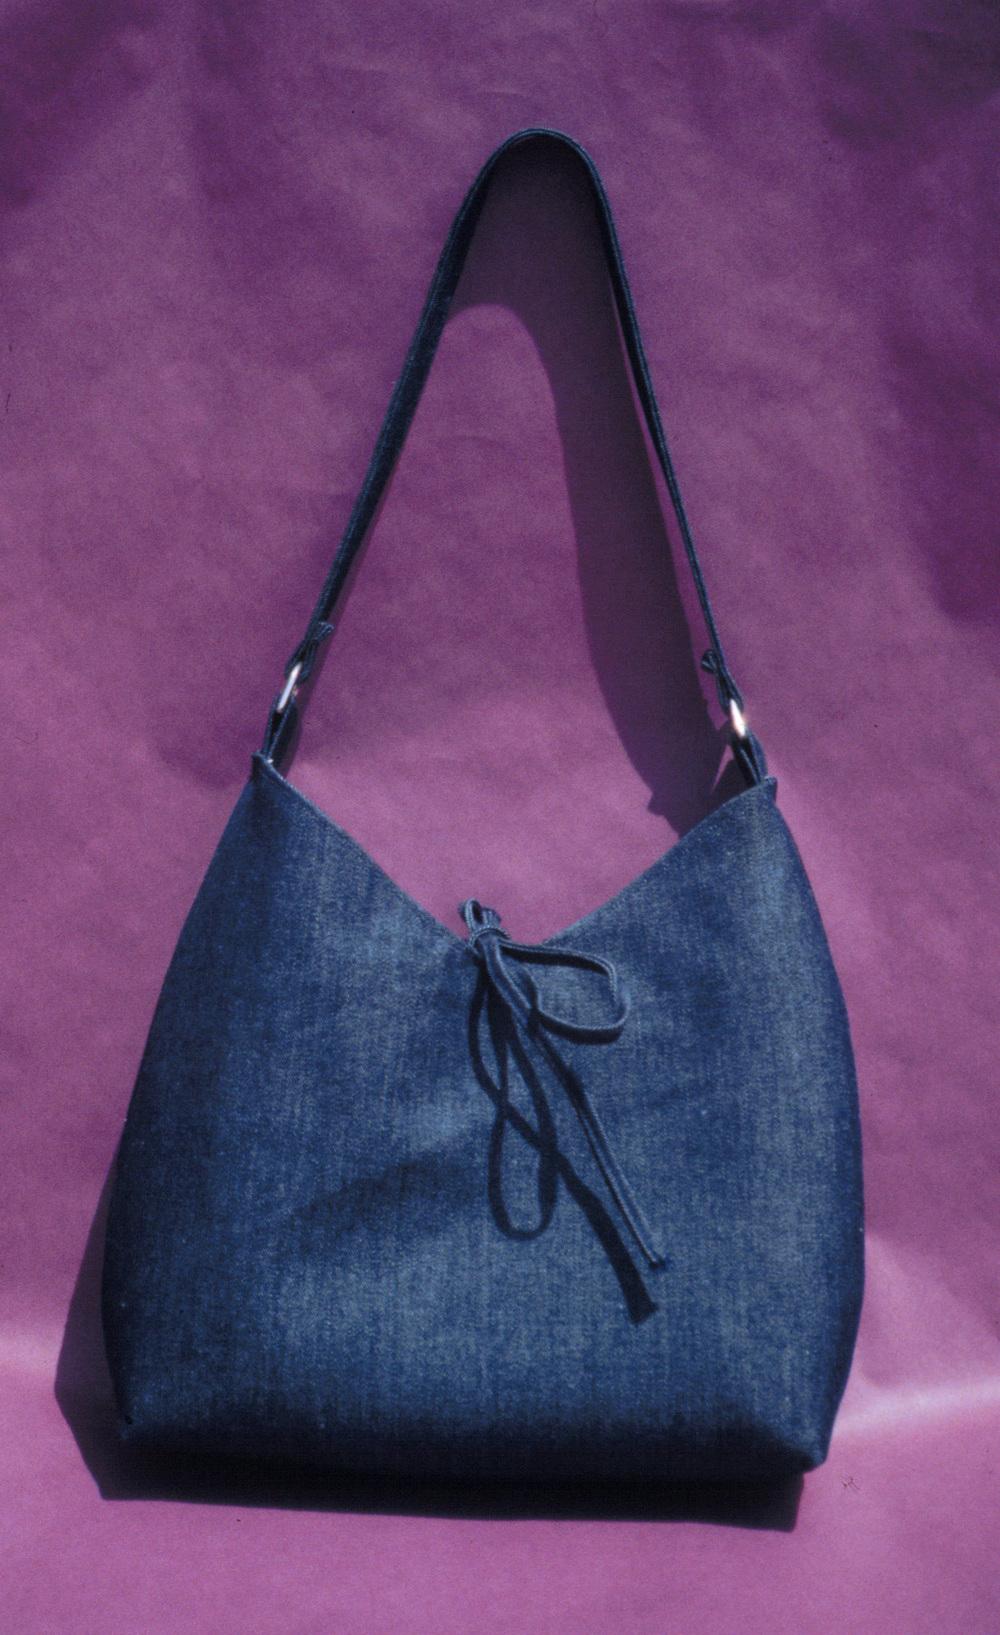 jeans-victor.jpg